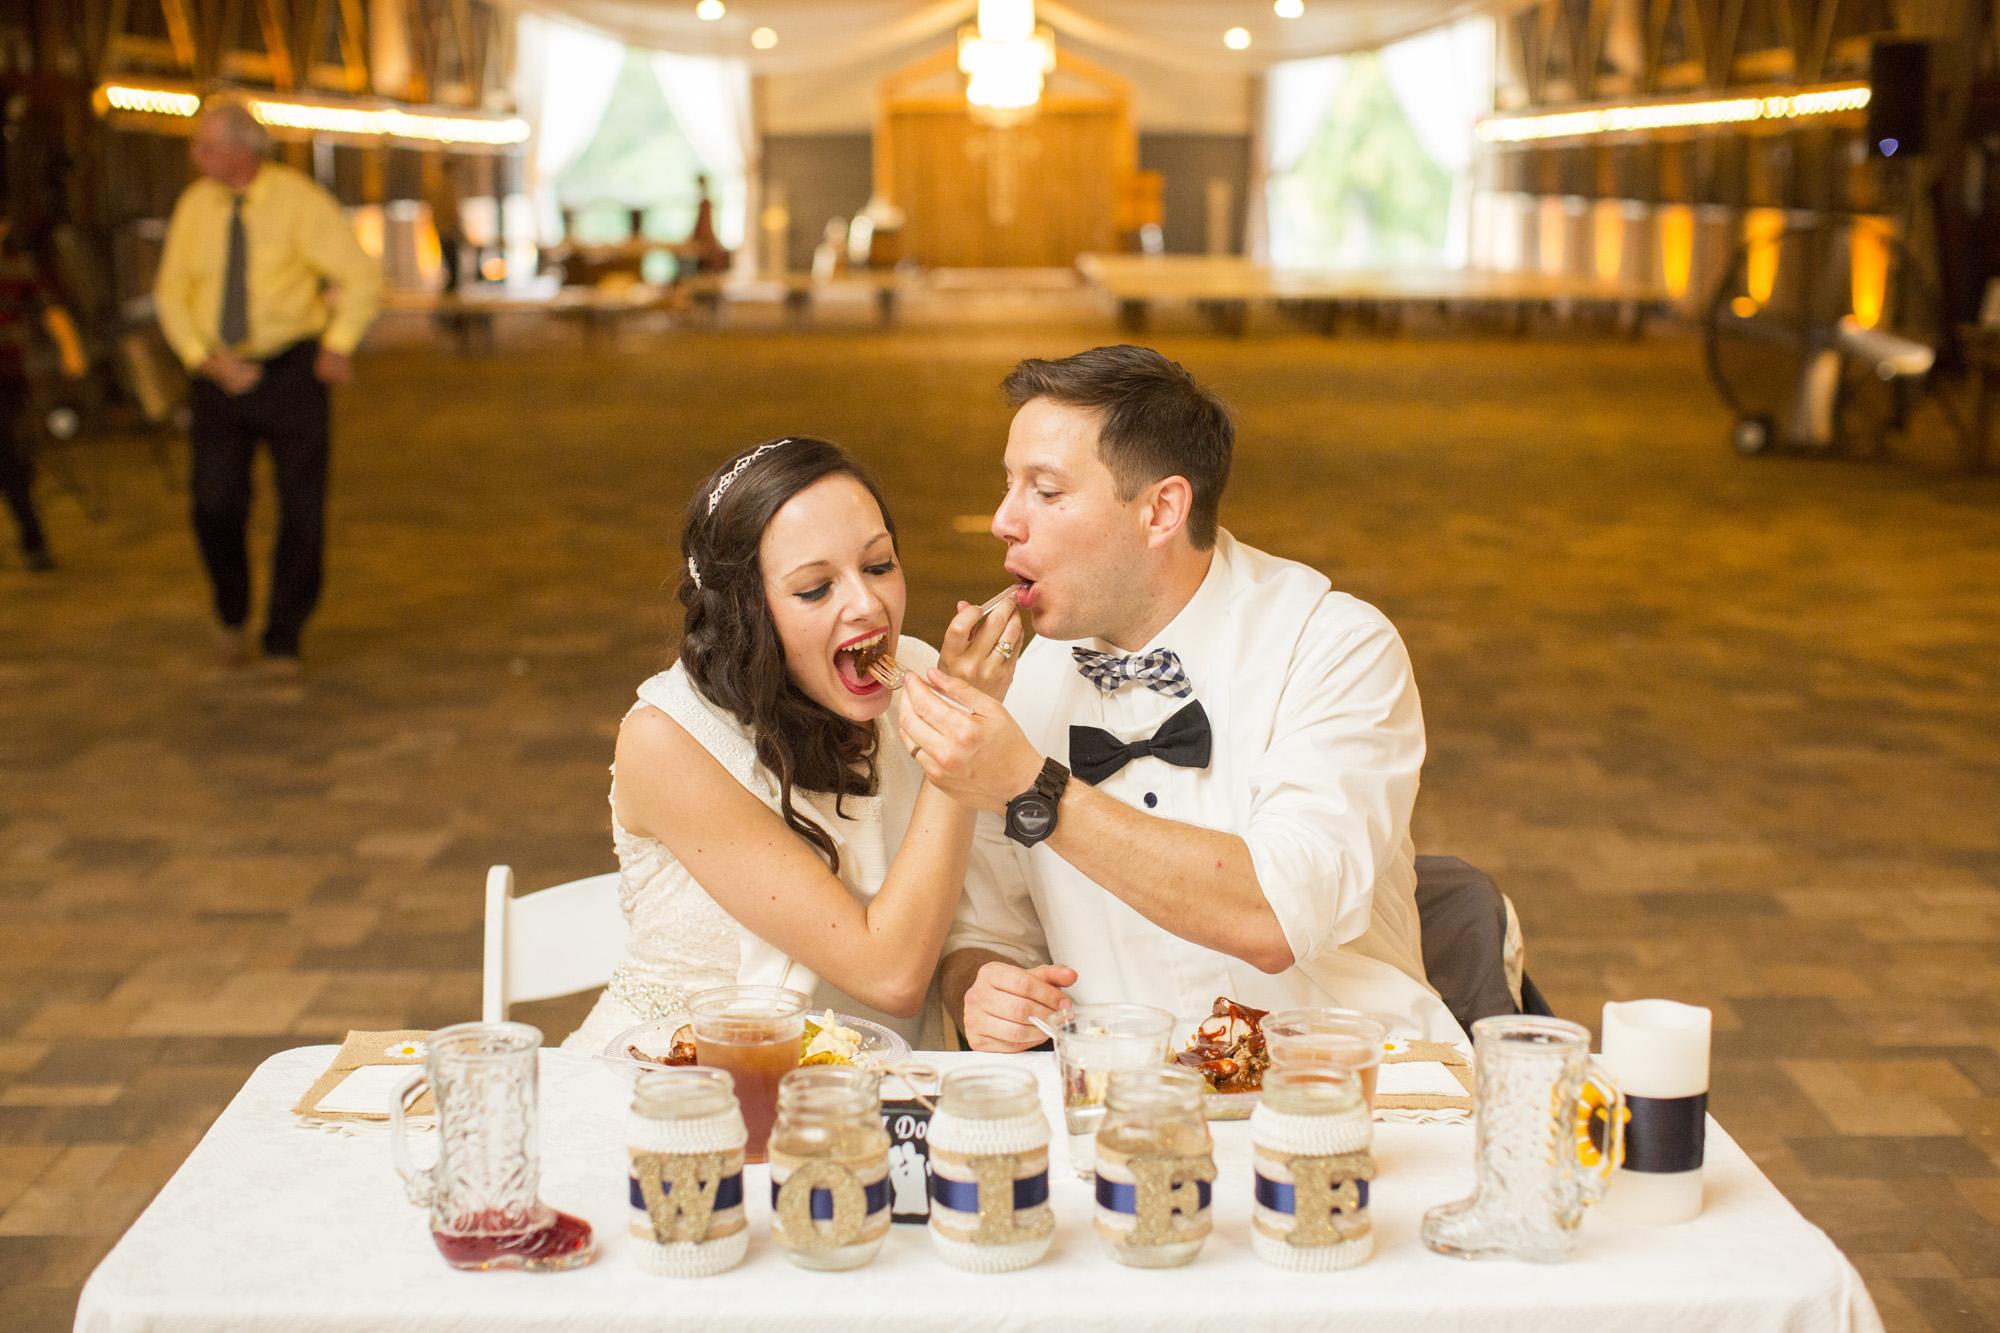 Seriously_Sabrina_Photography_Bowling_Green_Kentucky_Highland_Stables_Wedding_Wolff135.jpg